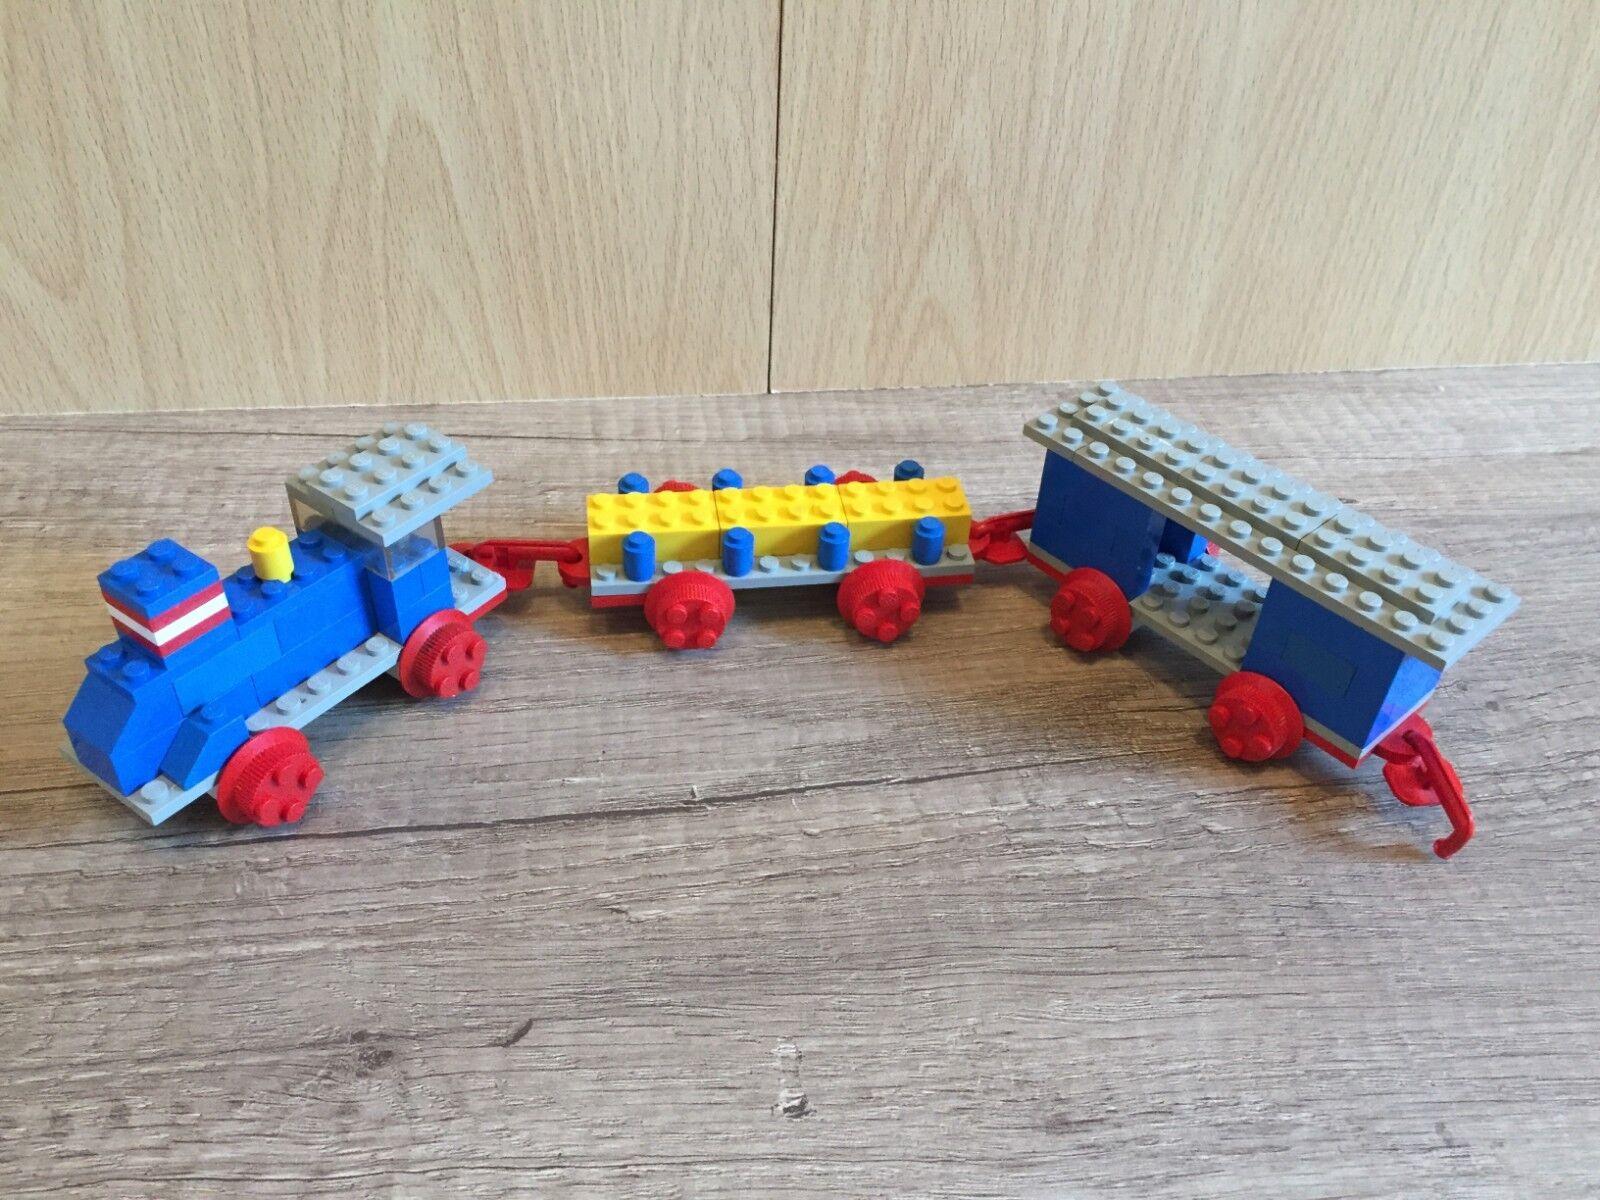 Lego 114 small train set Classic Zug Train Stadt City Town komplett complete